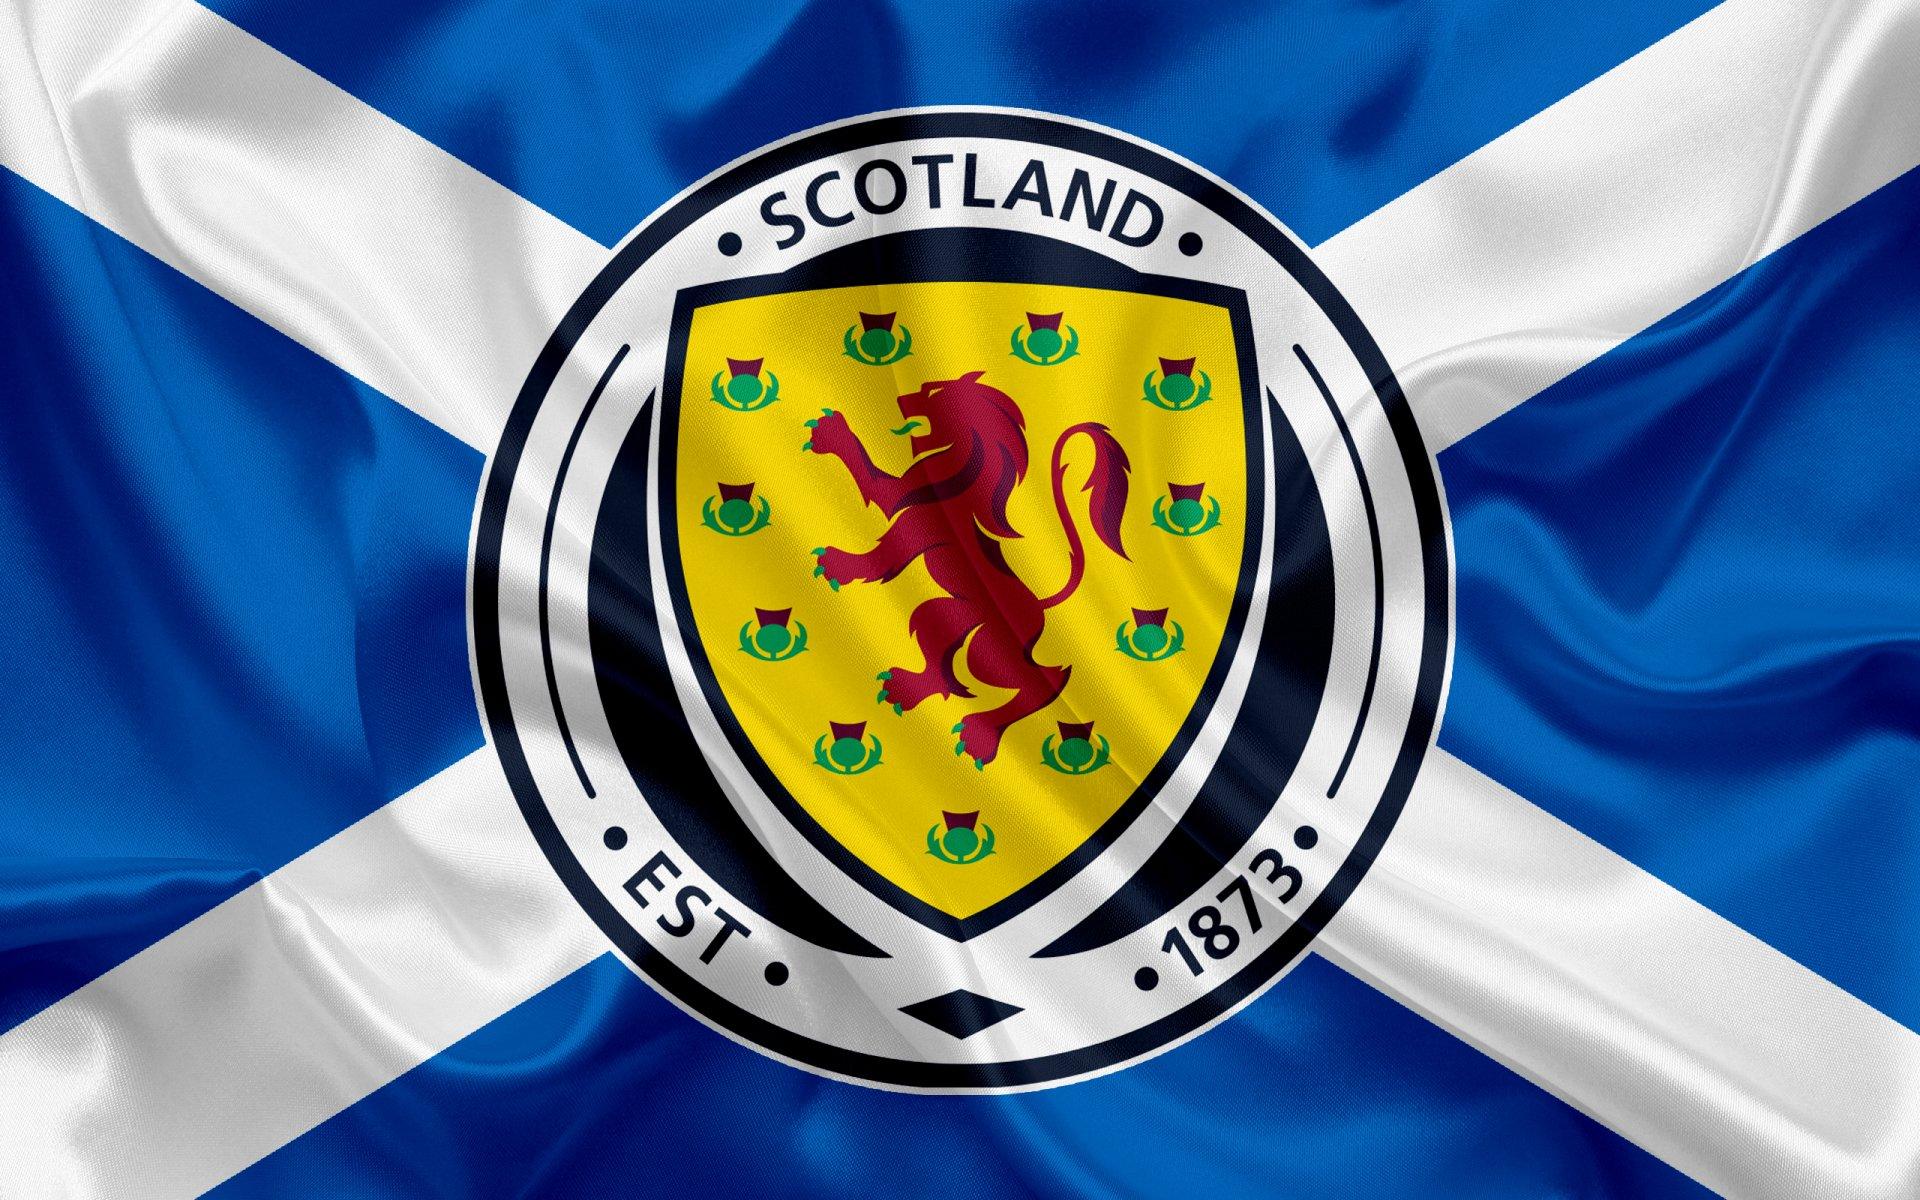 Scotland National Football Team Zoom Background 5